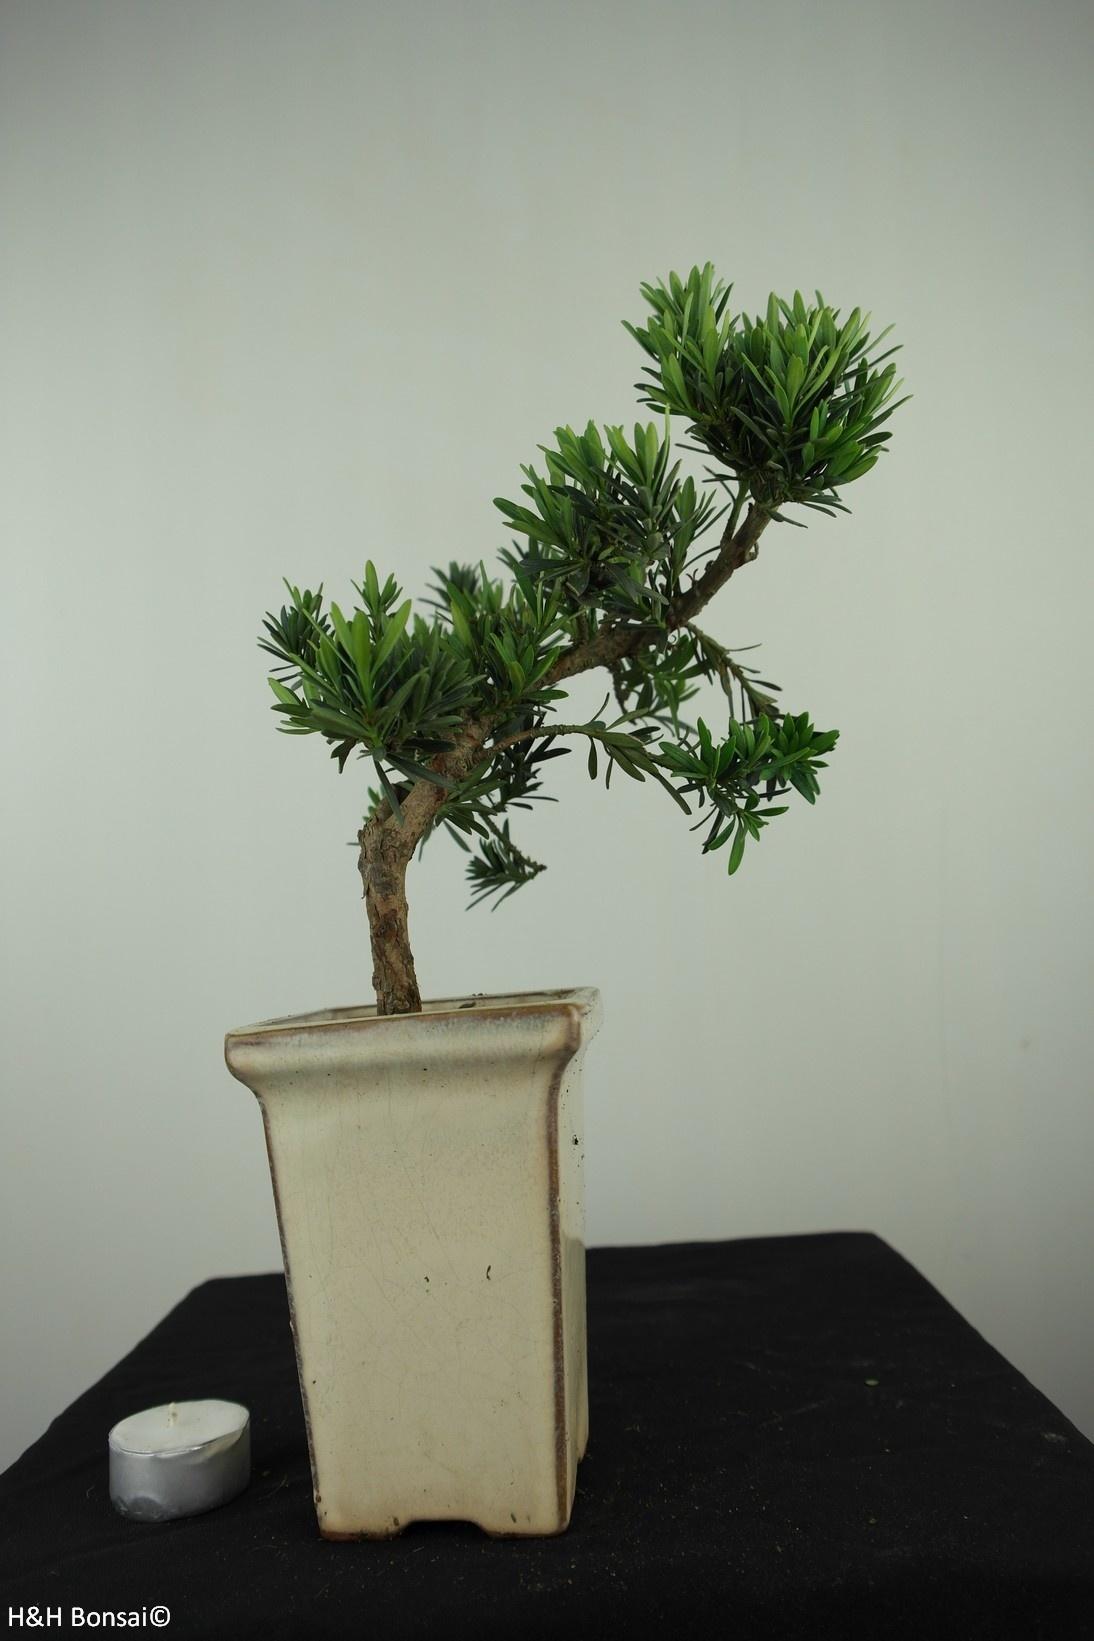 Bonsai Buddhist Pine, Podocarpus, no. 7595